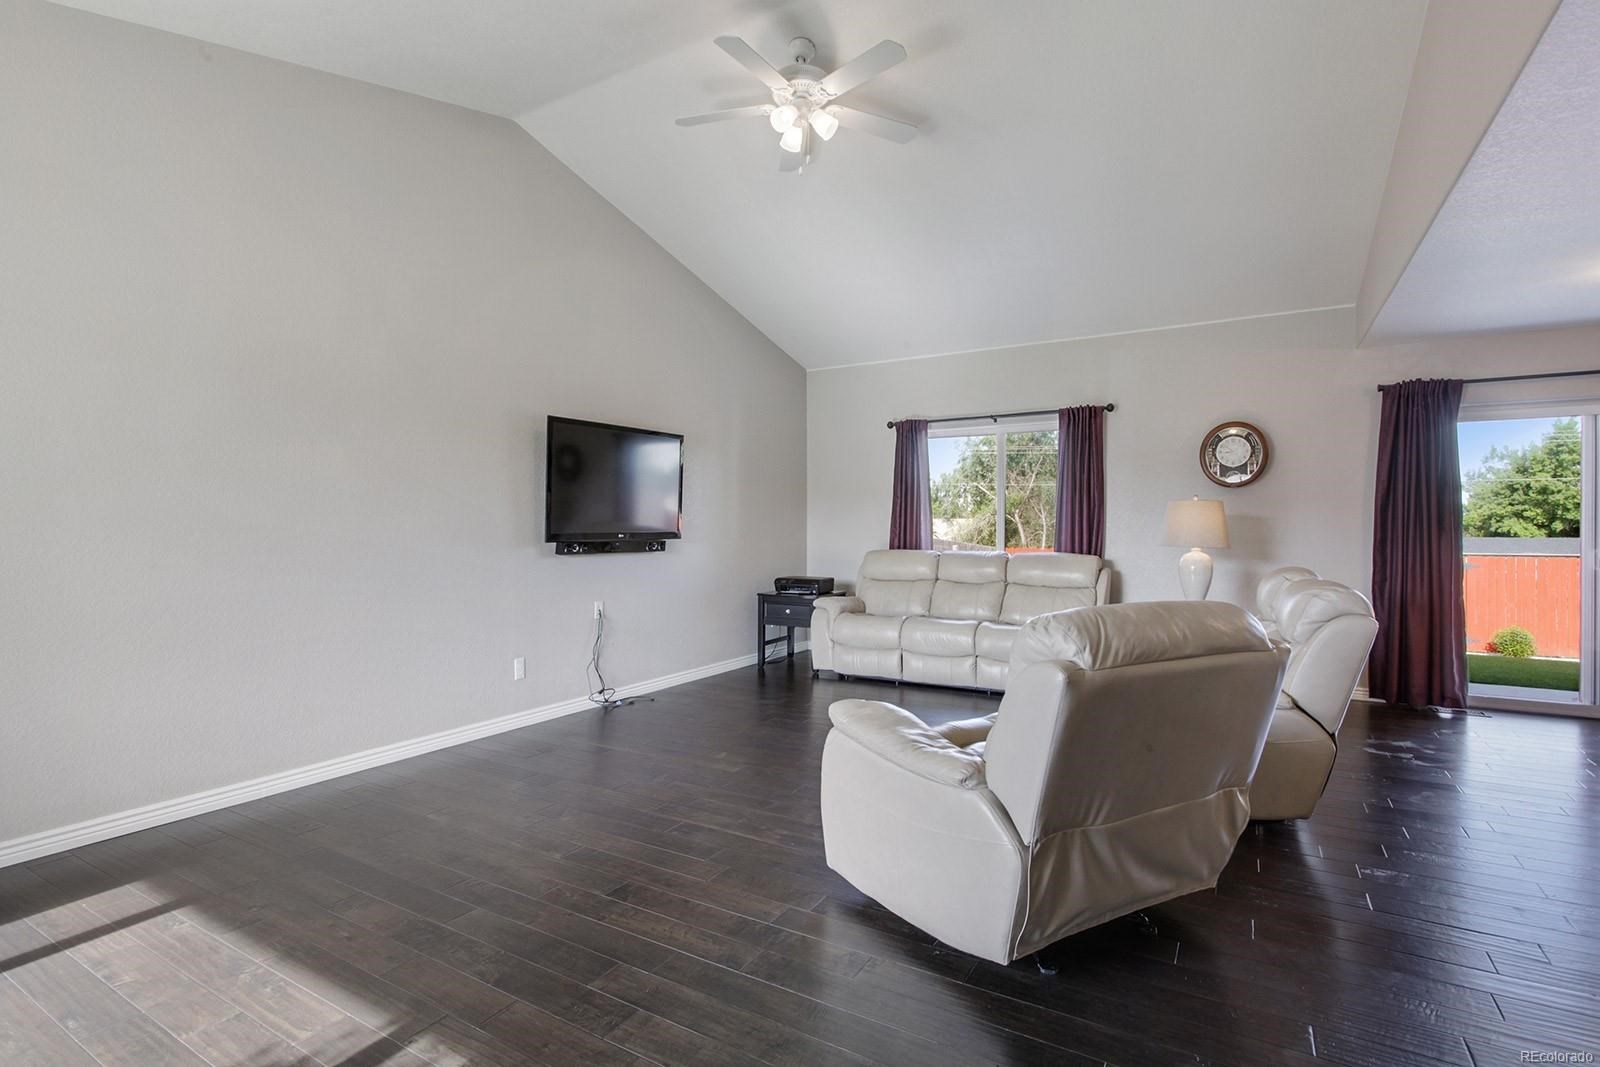 MLS# 5196946 - 4 - 305 Coal Ridge Drive, Frederick, CO 80530